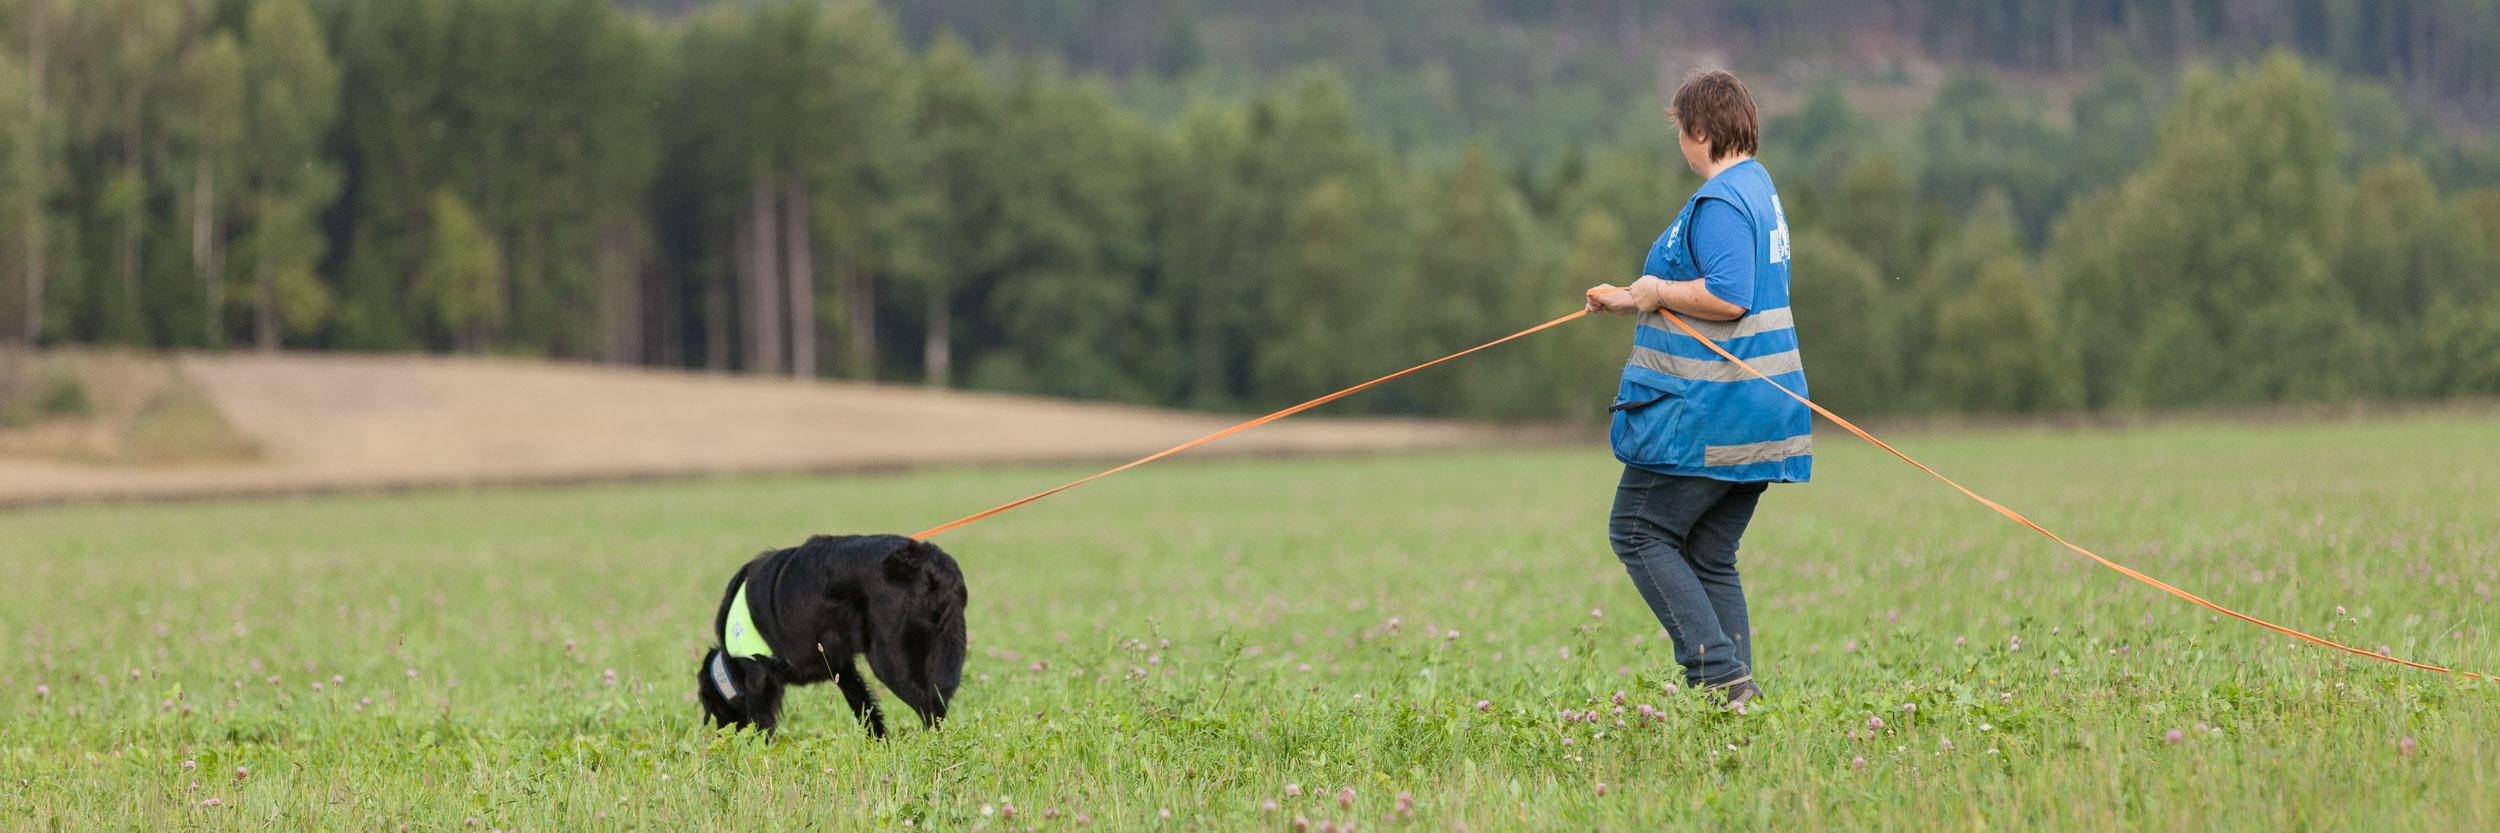 hundefotograf-hundefotografering-fotograf-sarpsborg-